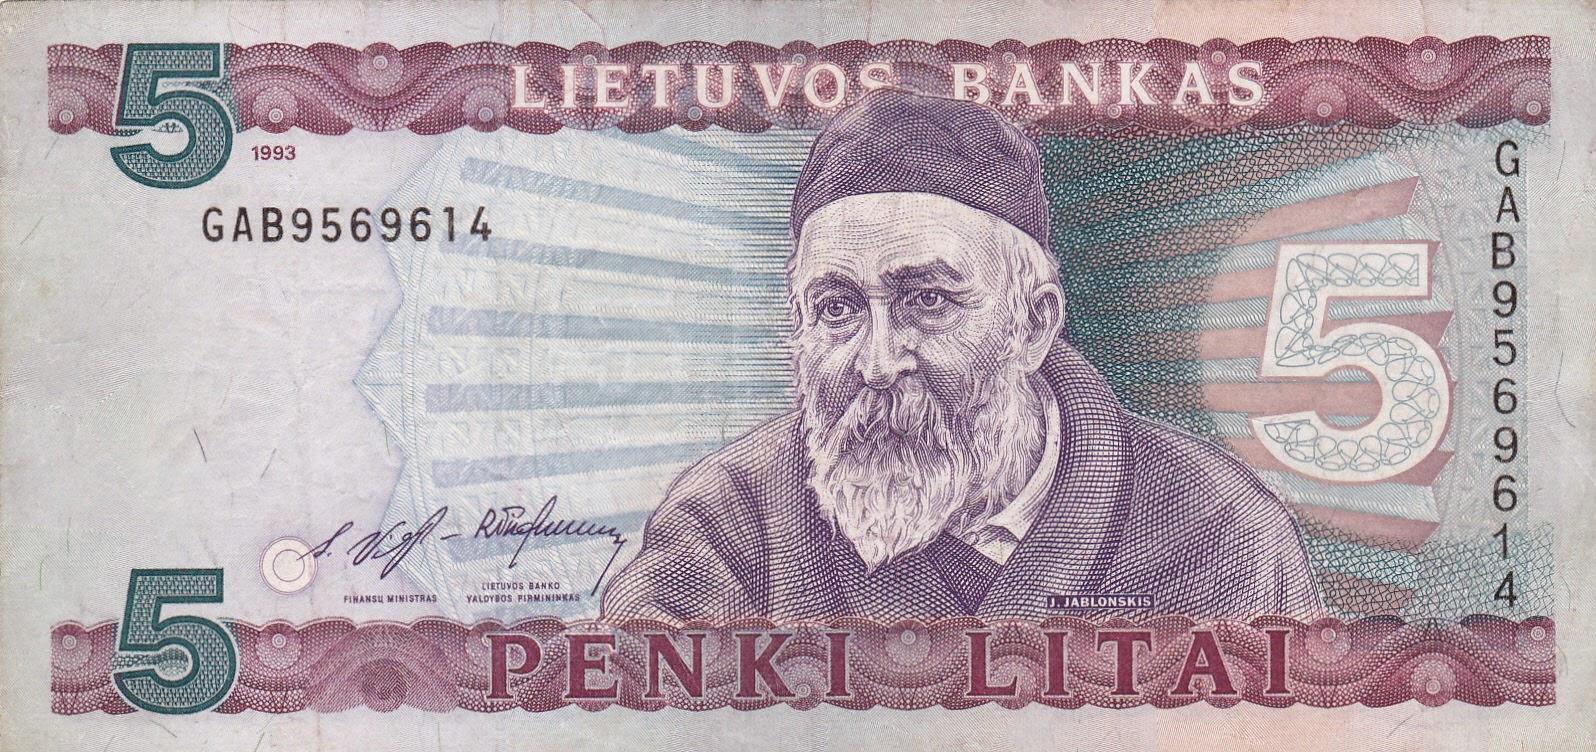 Banknotes of Lithuania 5 Litu banknote 1993 Jonas Jablonskis